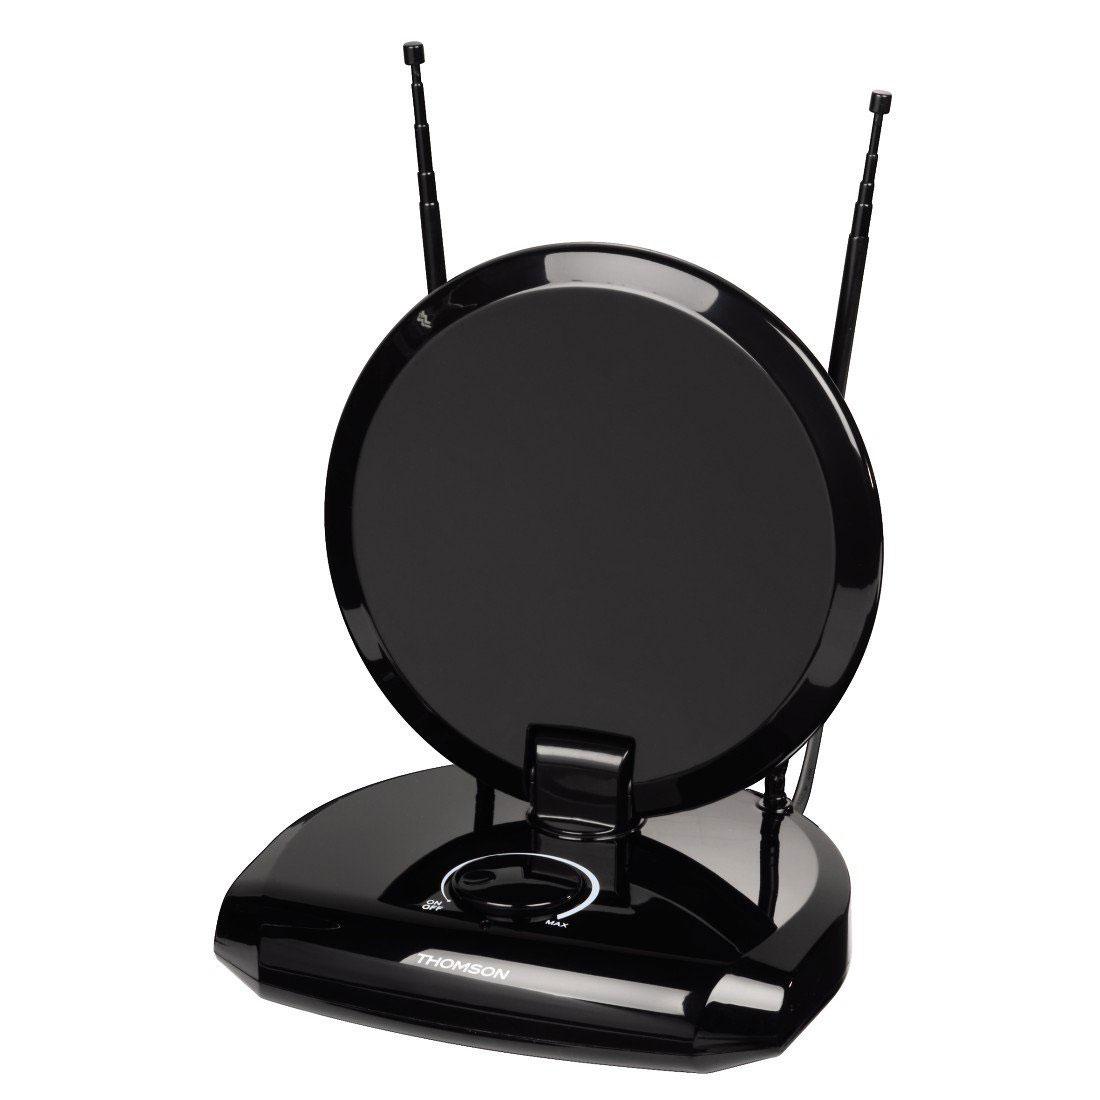 thomson ant1731 noir 00131916 achat vente antenne. Black Bedroom Furniture Sets. Home Design Ideas